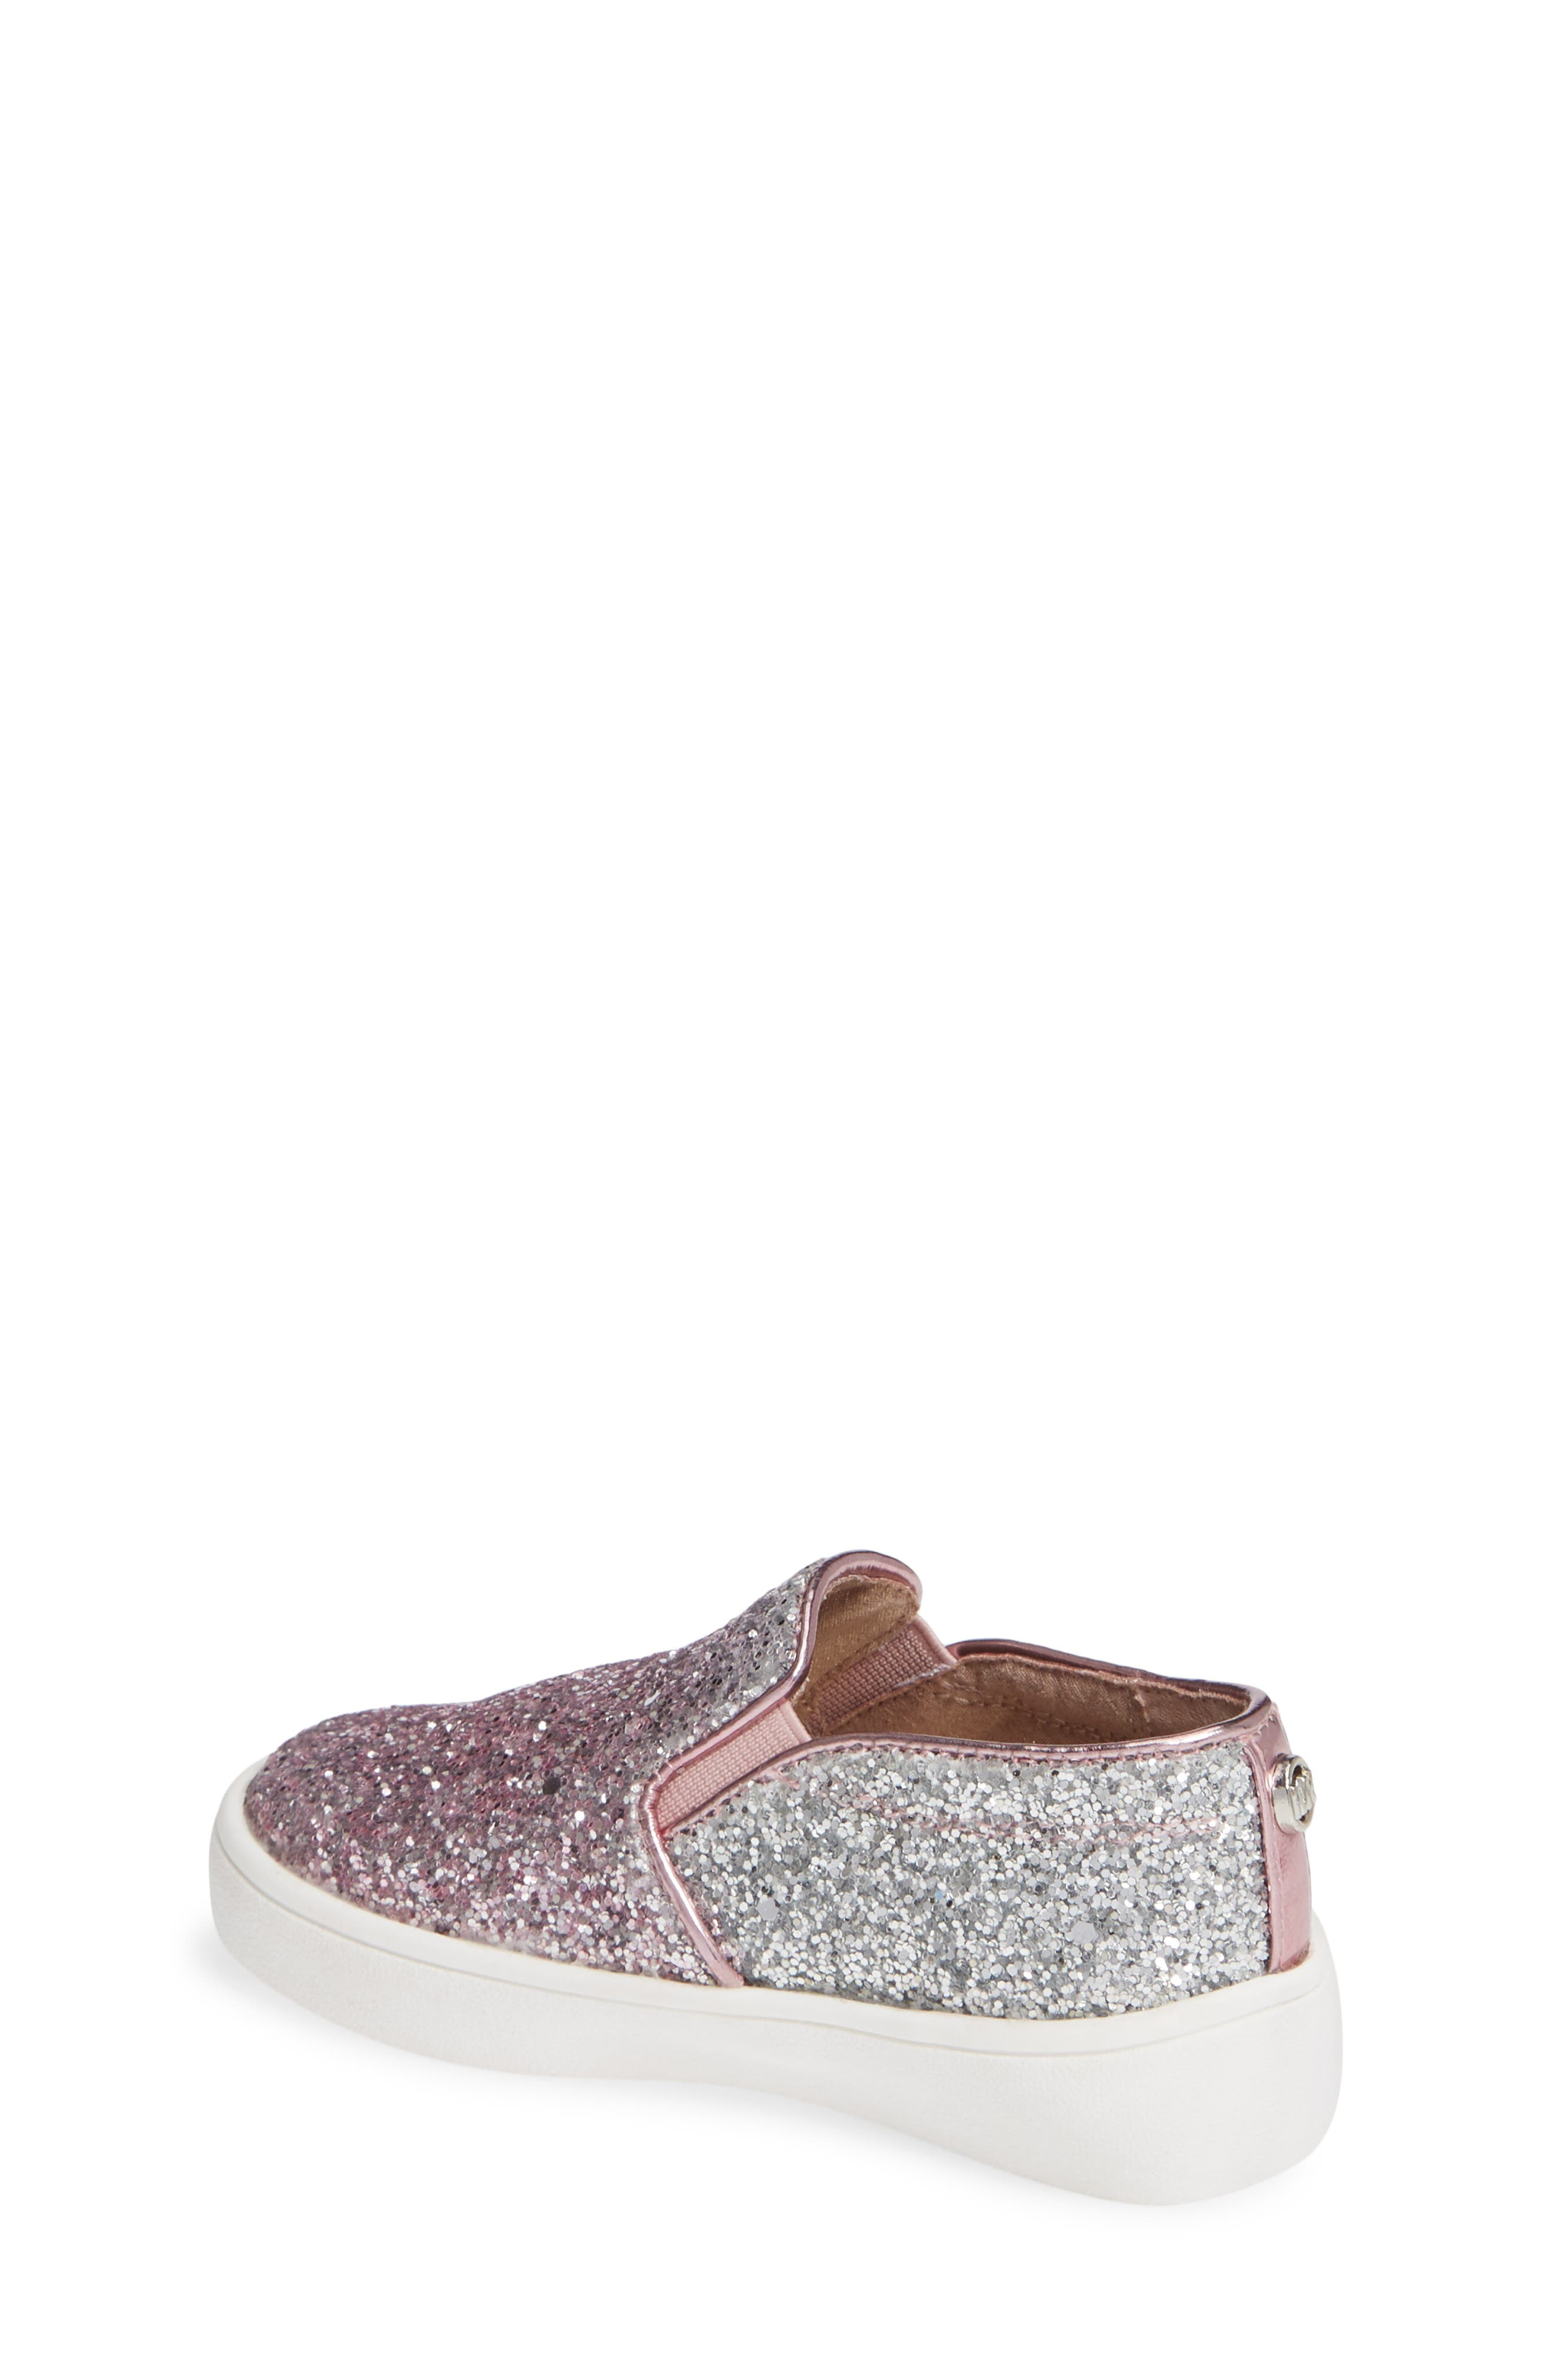 Ivy Ombré Glitter Slip-On Sneaker,                             Alternate thumbnail 2, color,                             Pink Silver